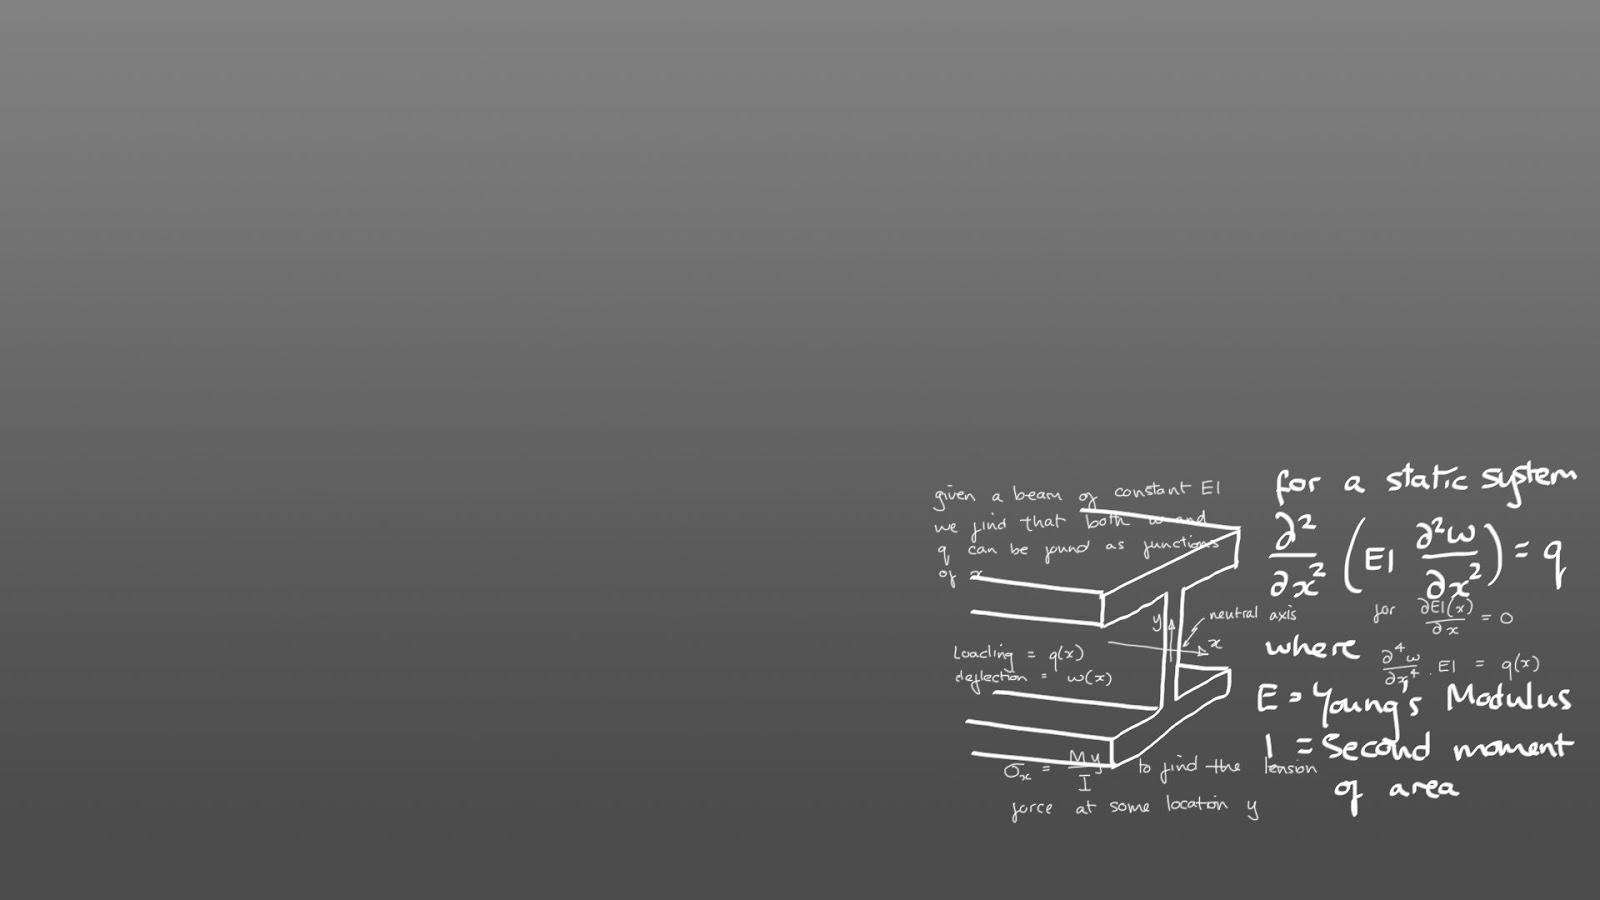 http://3.bp.blogspot.com/-o3q_bcbIOqE/UHg4fgApb-I/AAAAAAAAGrU/ImZeCNw5w0g/s1600/Math_Wallpaper_6.jpg